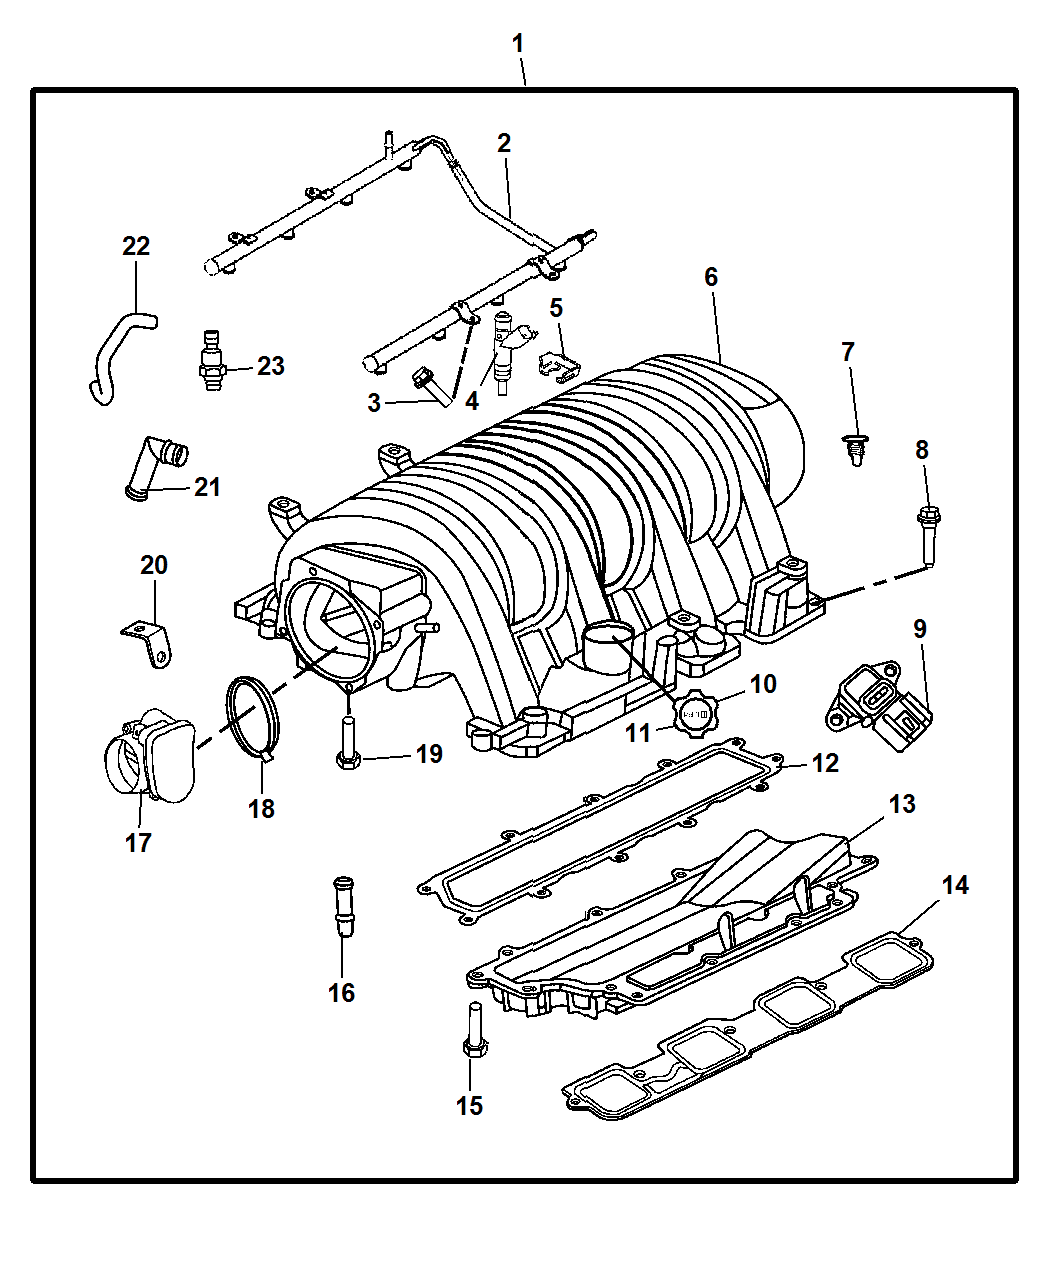 2007 Hemi V8 Engine Diagram Wiring Diagrams All